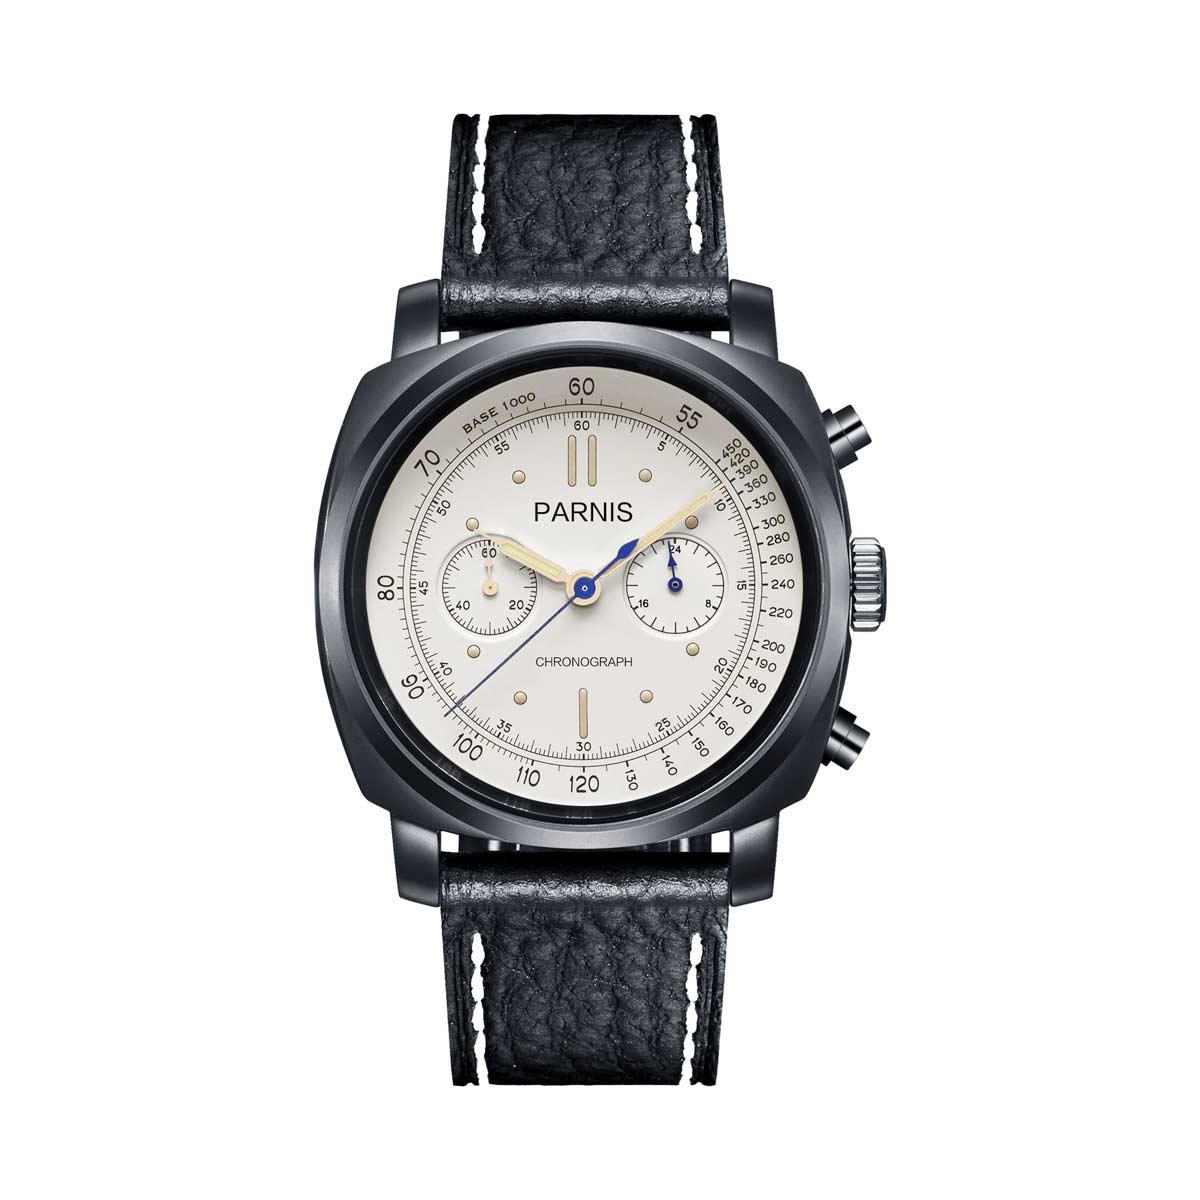 PARNIS Parnis 石英手表 [PA6046-B-S5EL-WHbkBKw] 平行进口真正箱制造商保修 12 个月 10P01Oct16。